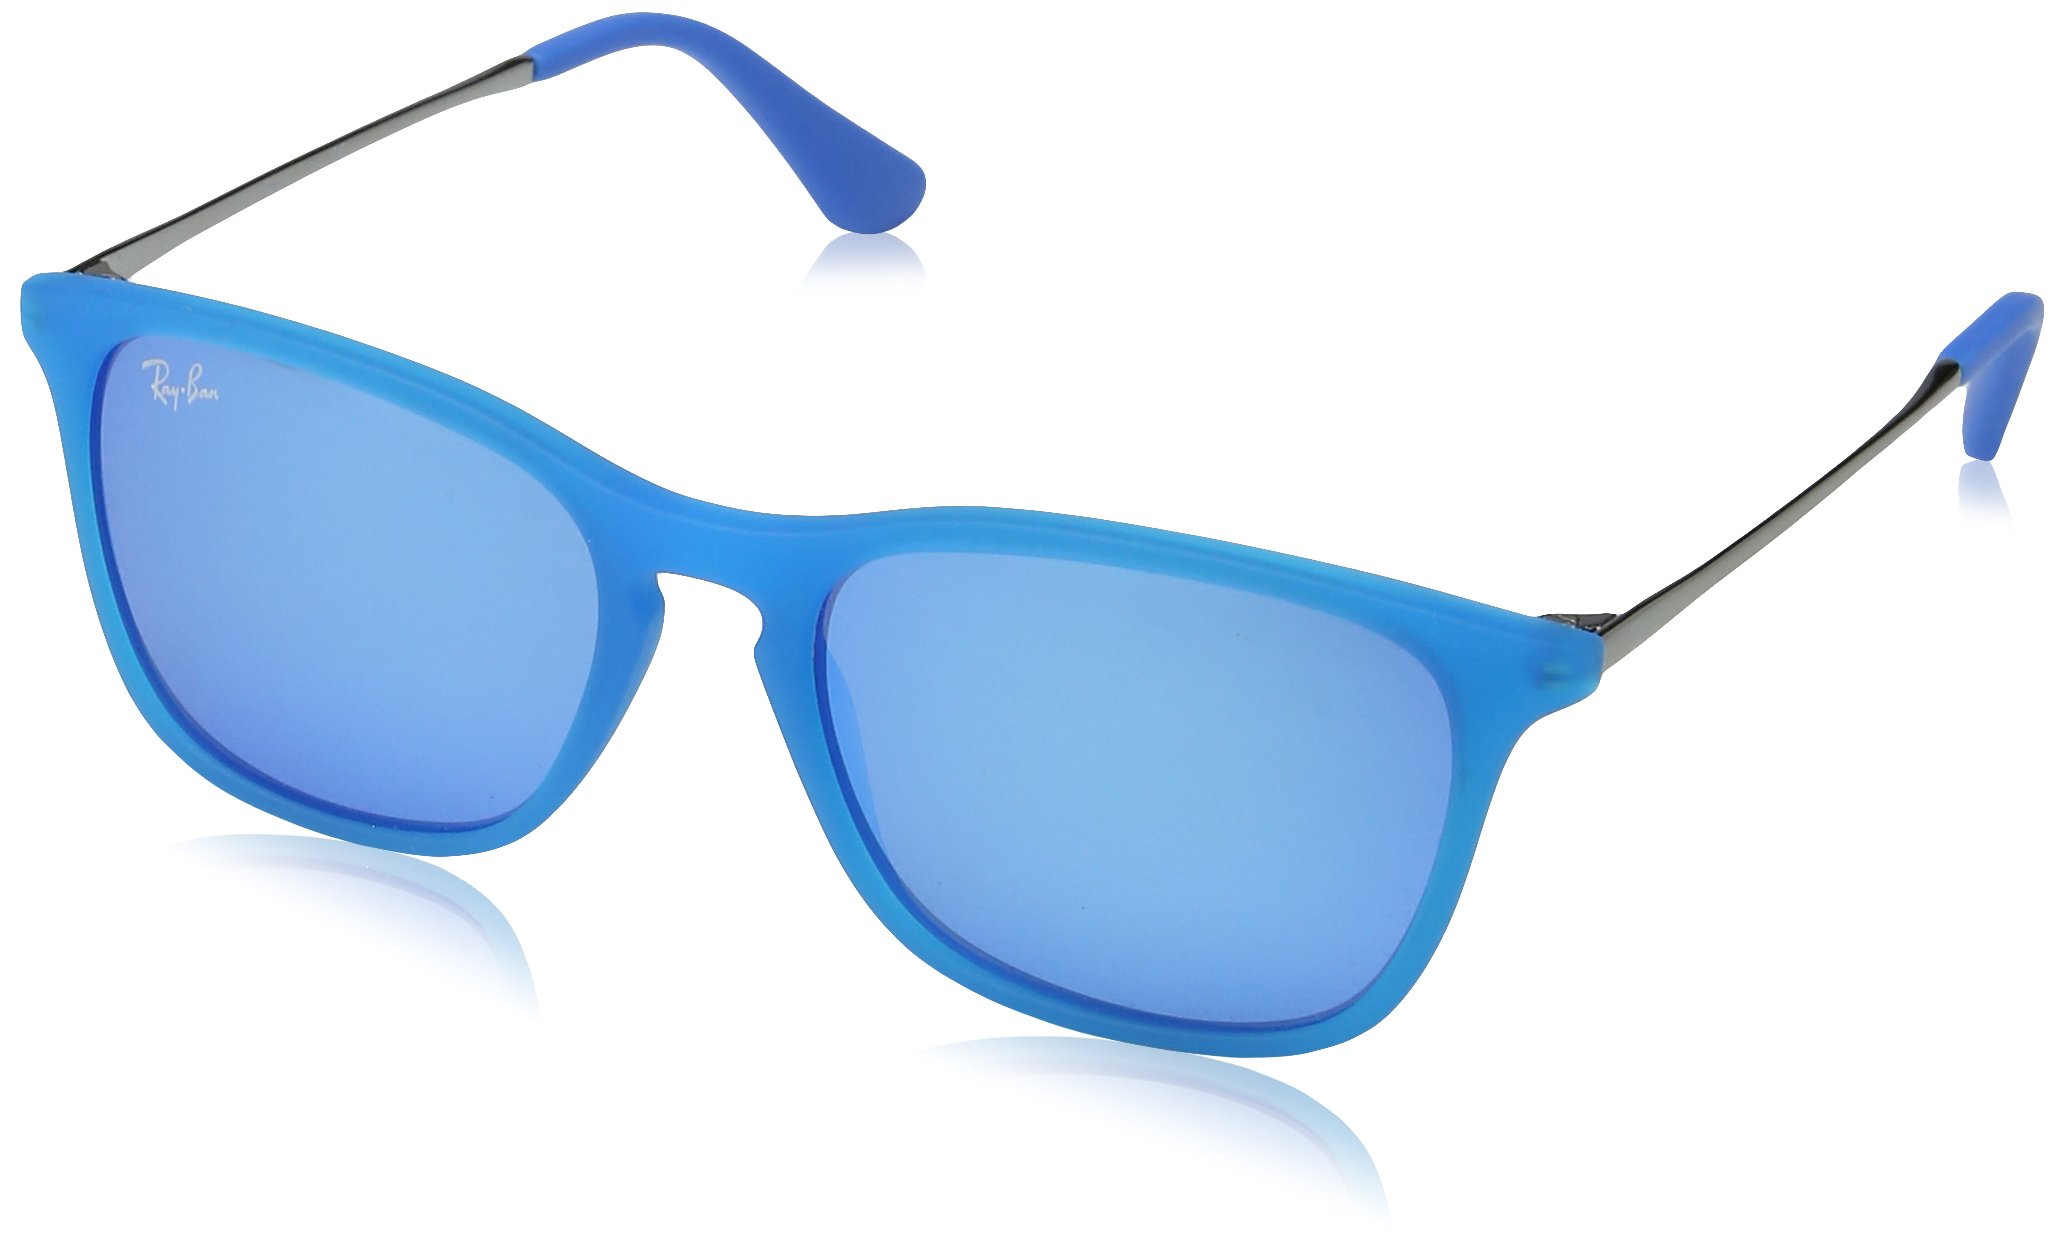 galleon attcl kids tr90 polarized sunglasses wayfarer. Black Bedroom Furniture Sets. Home Design Ideas